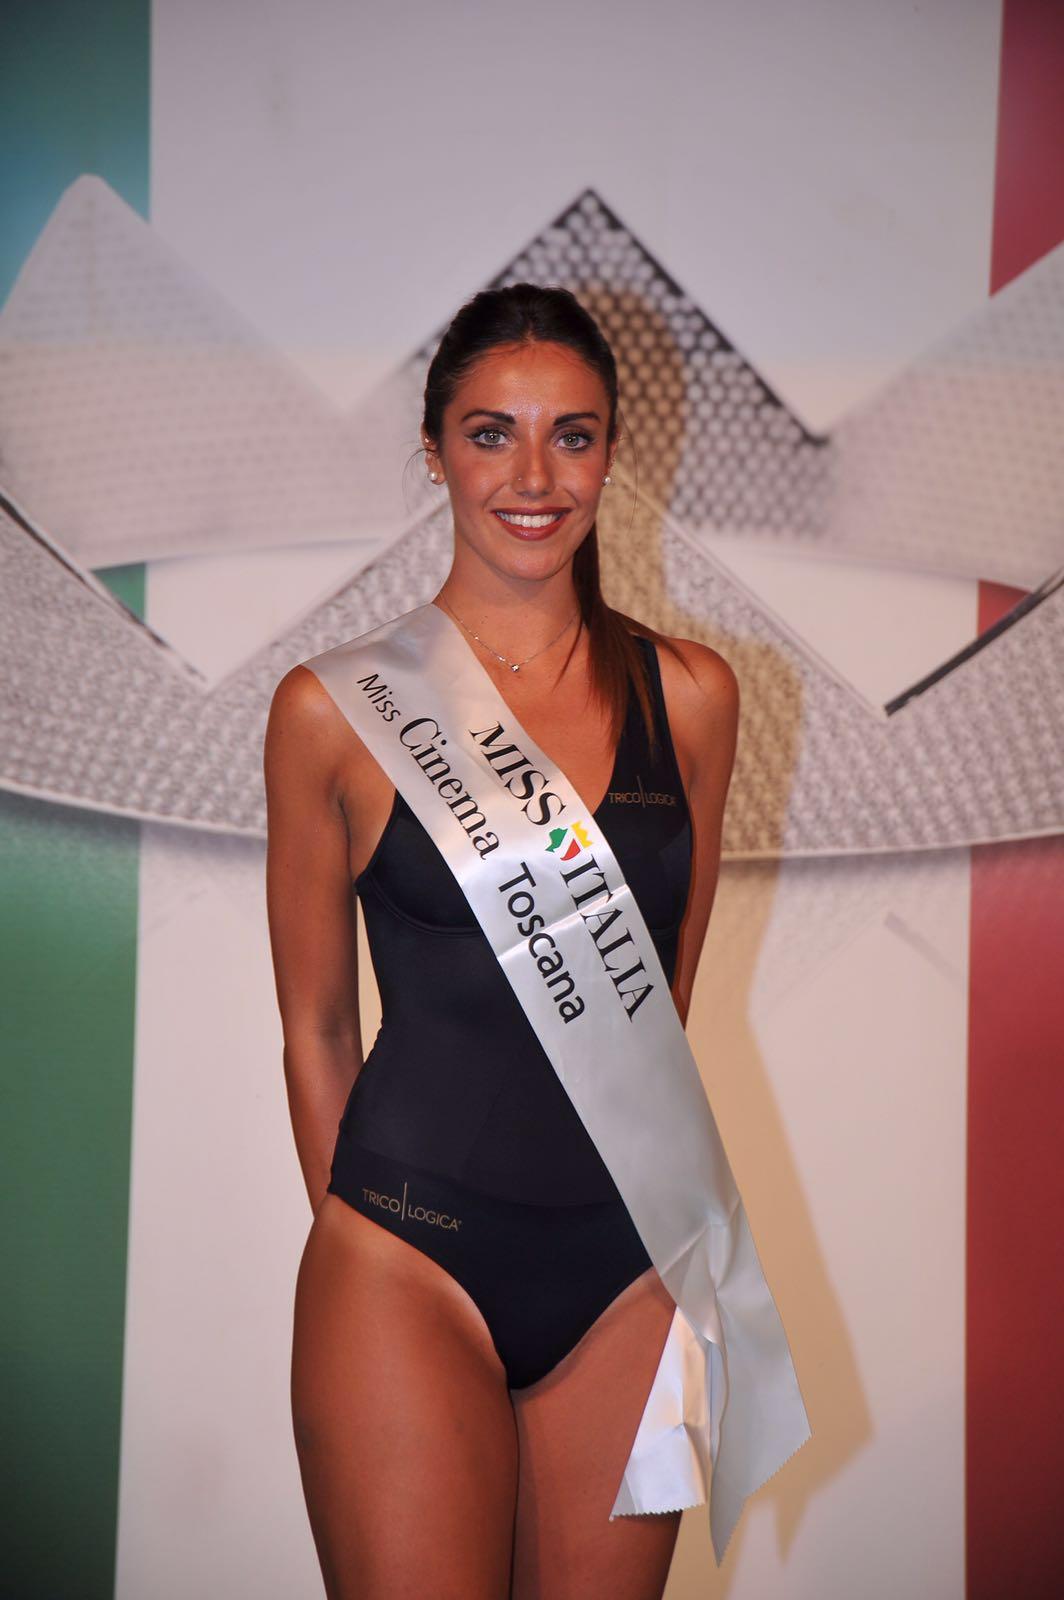 Ondina vince la fascia di Miss Cinema Toscana